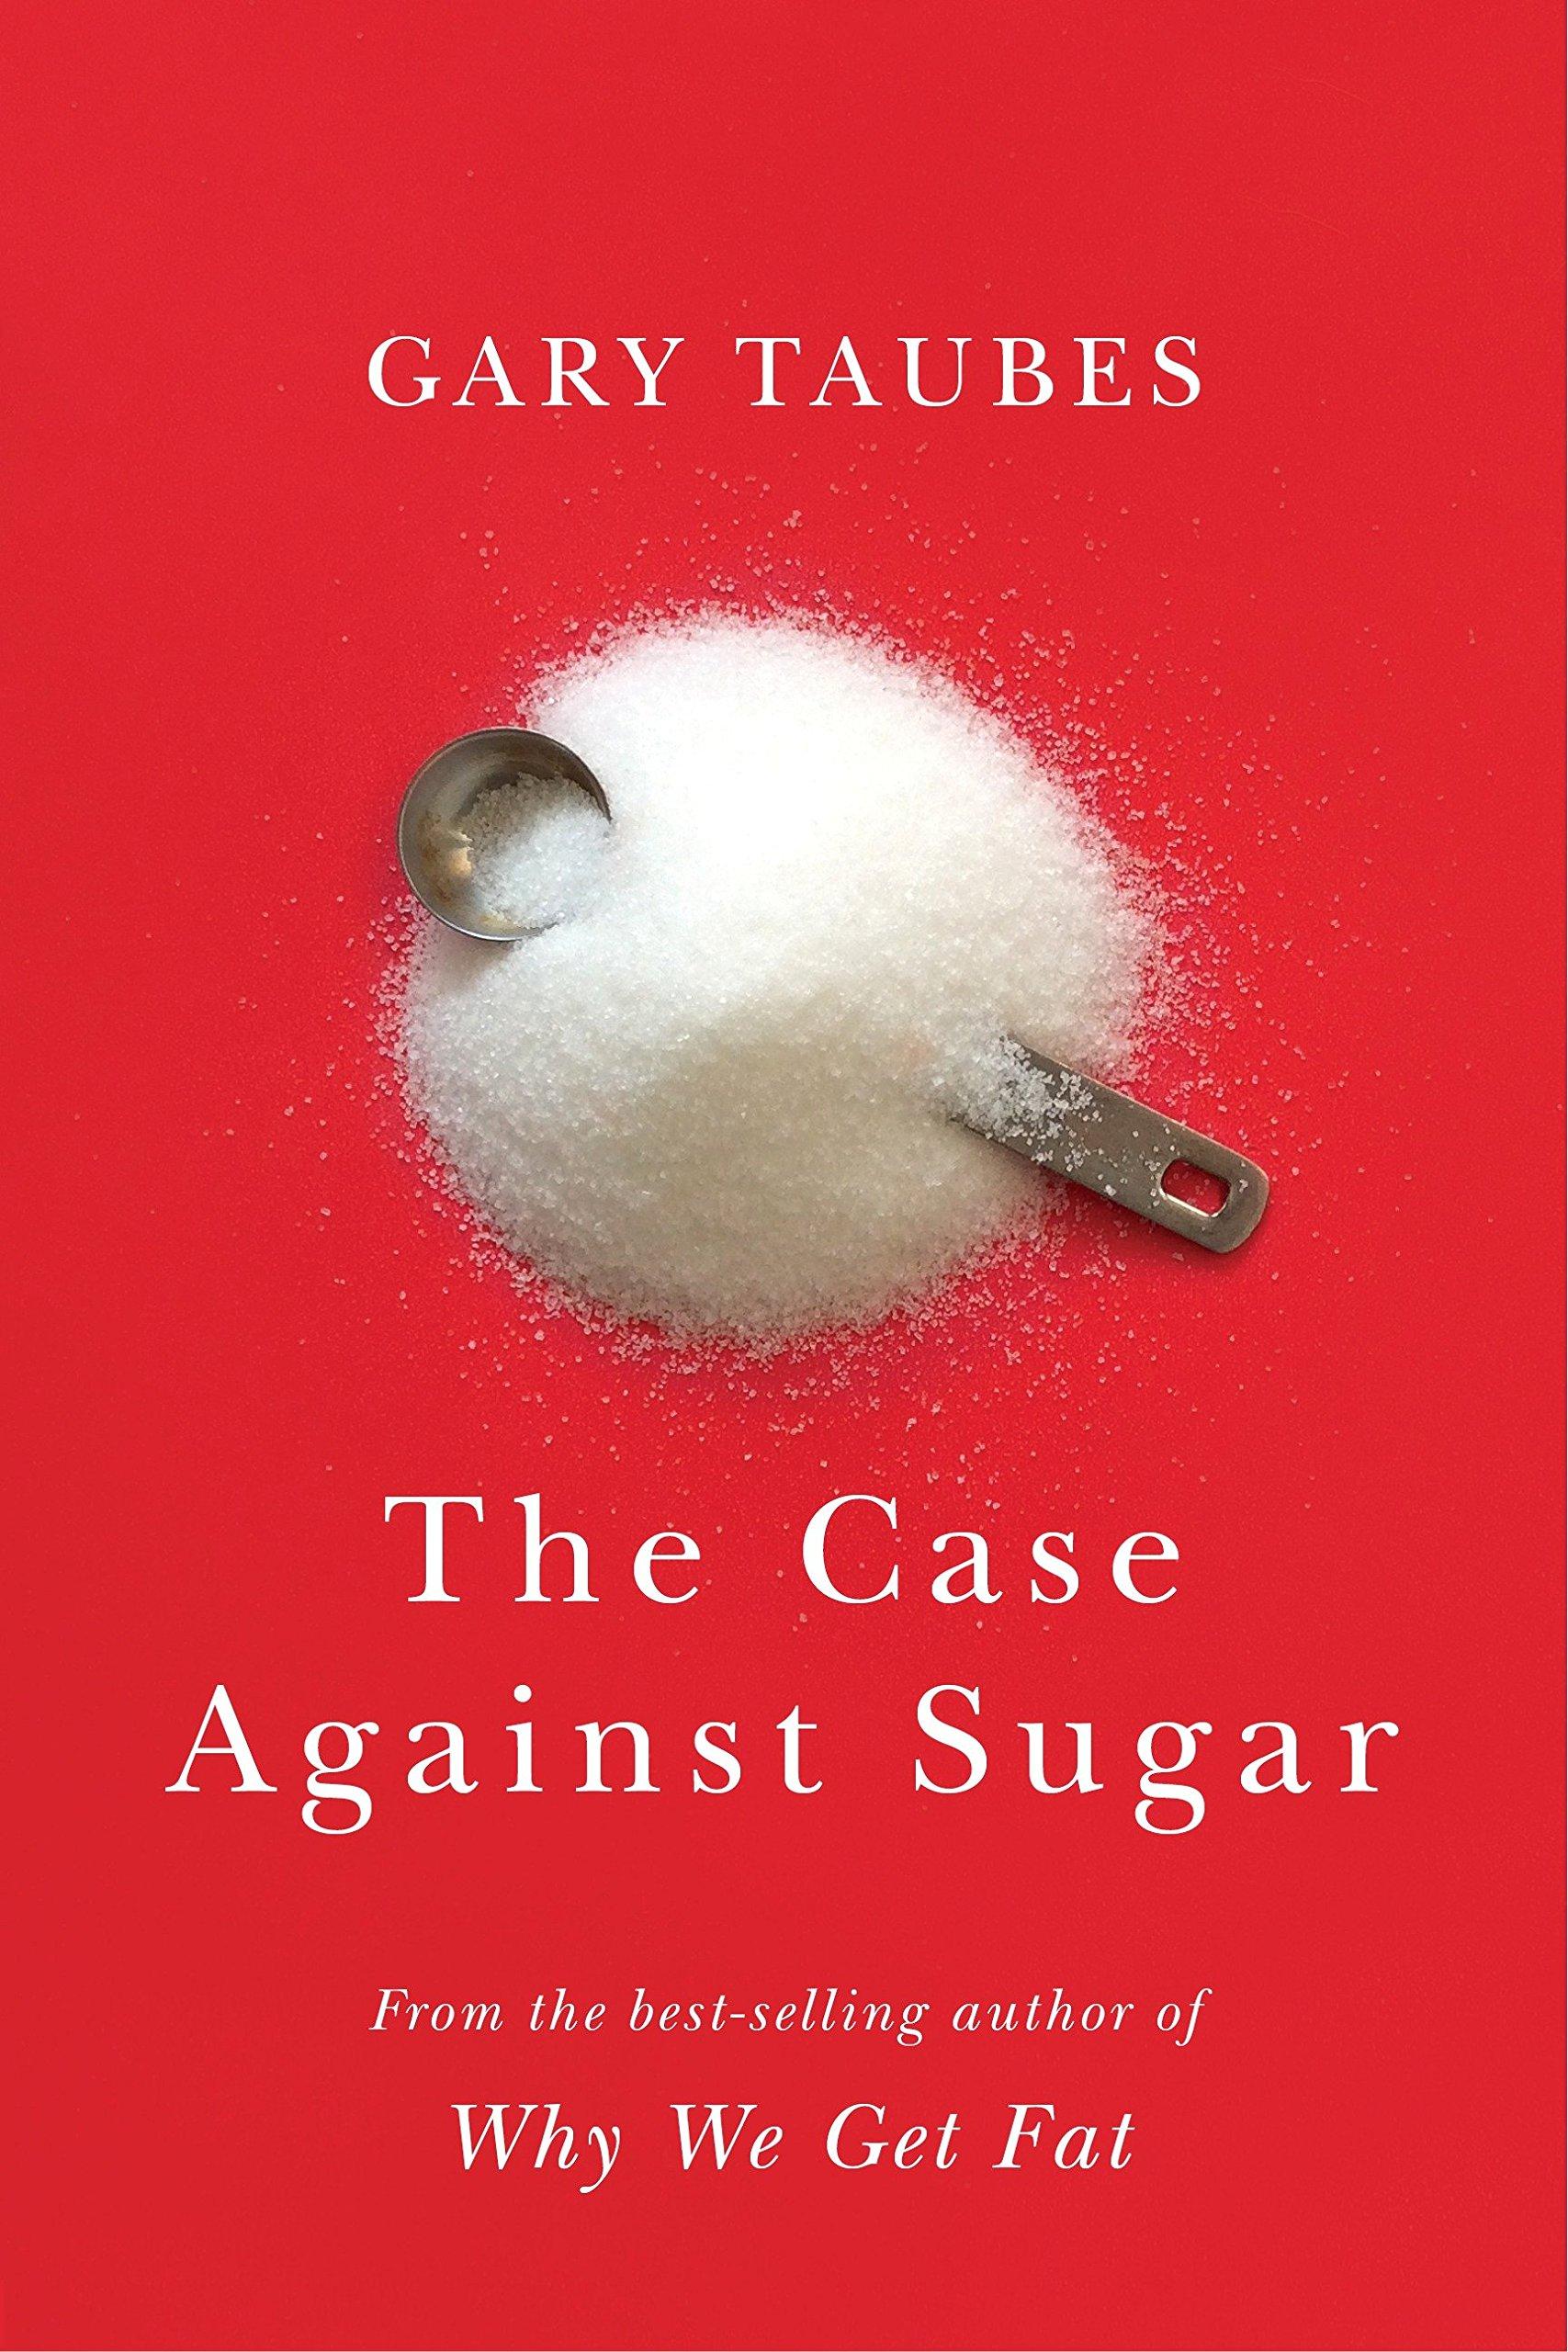 carlos velo the case against sugar Gay Taubes